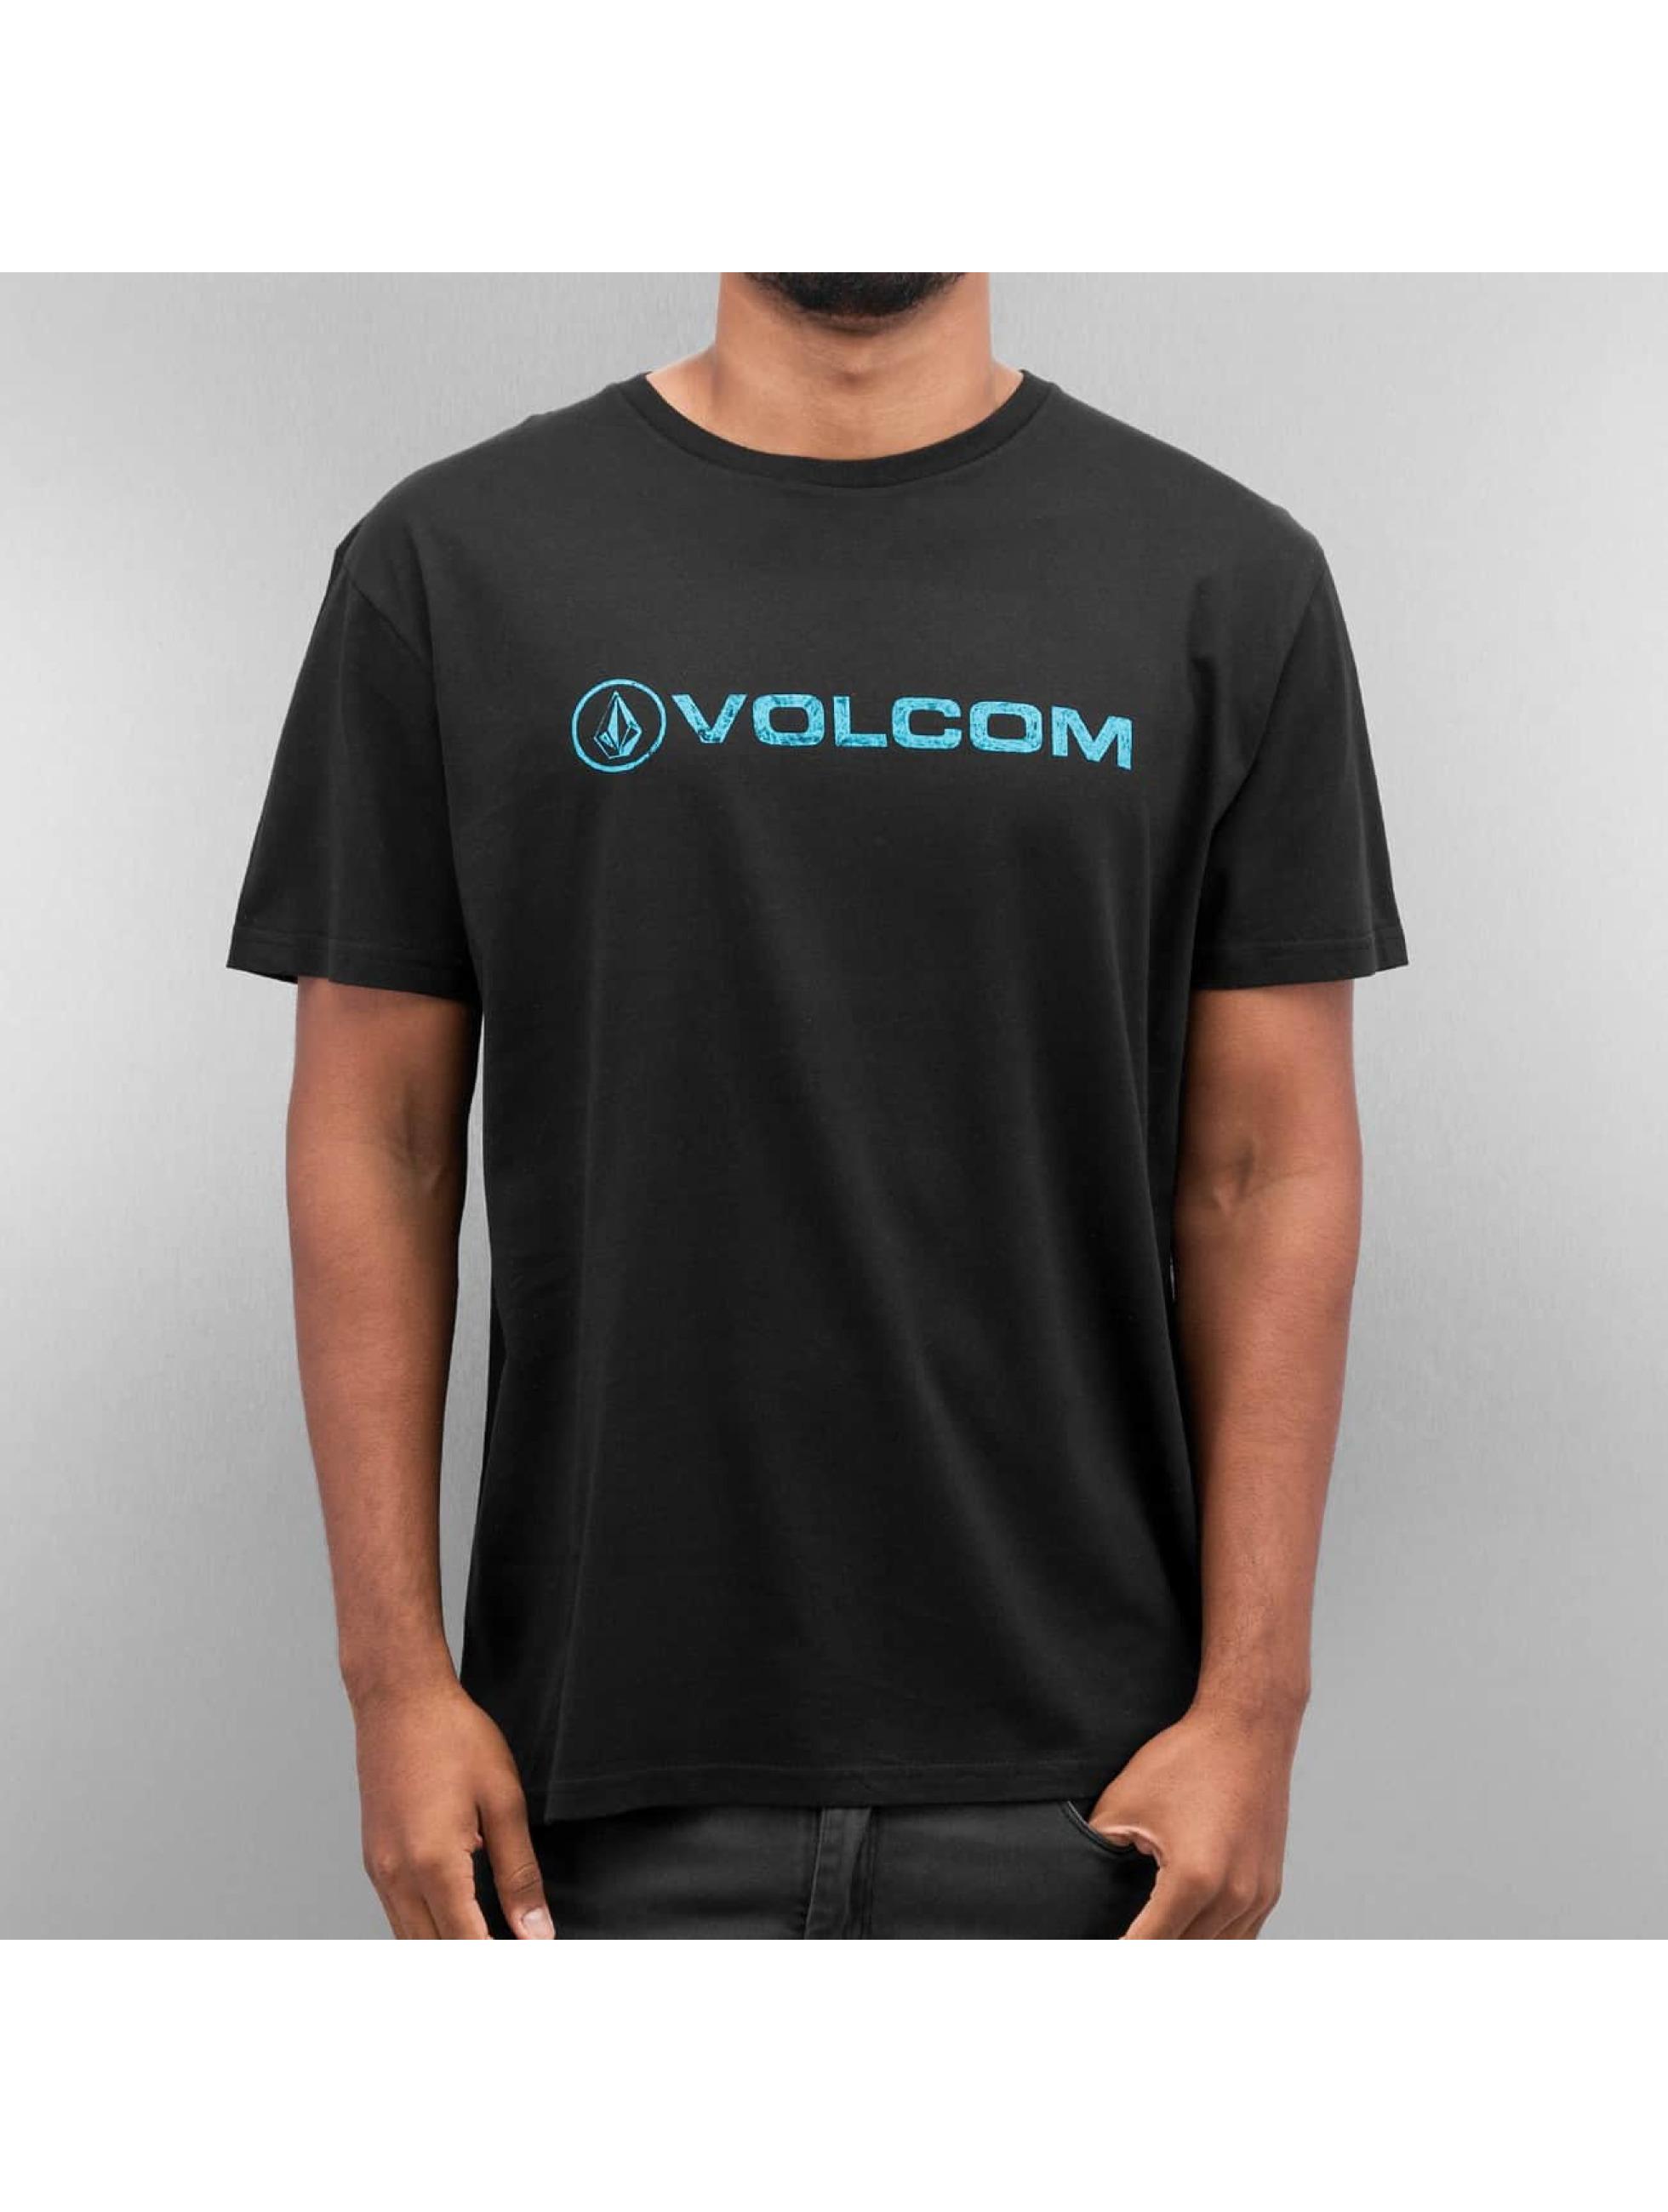 Volcom T-shirt Euro Pencil svart